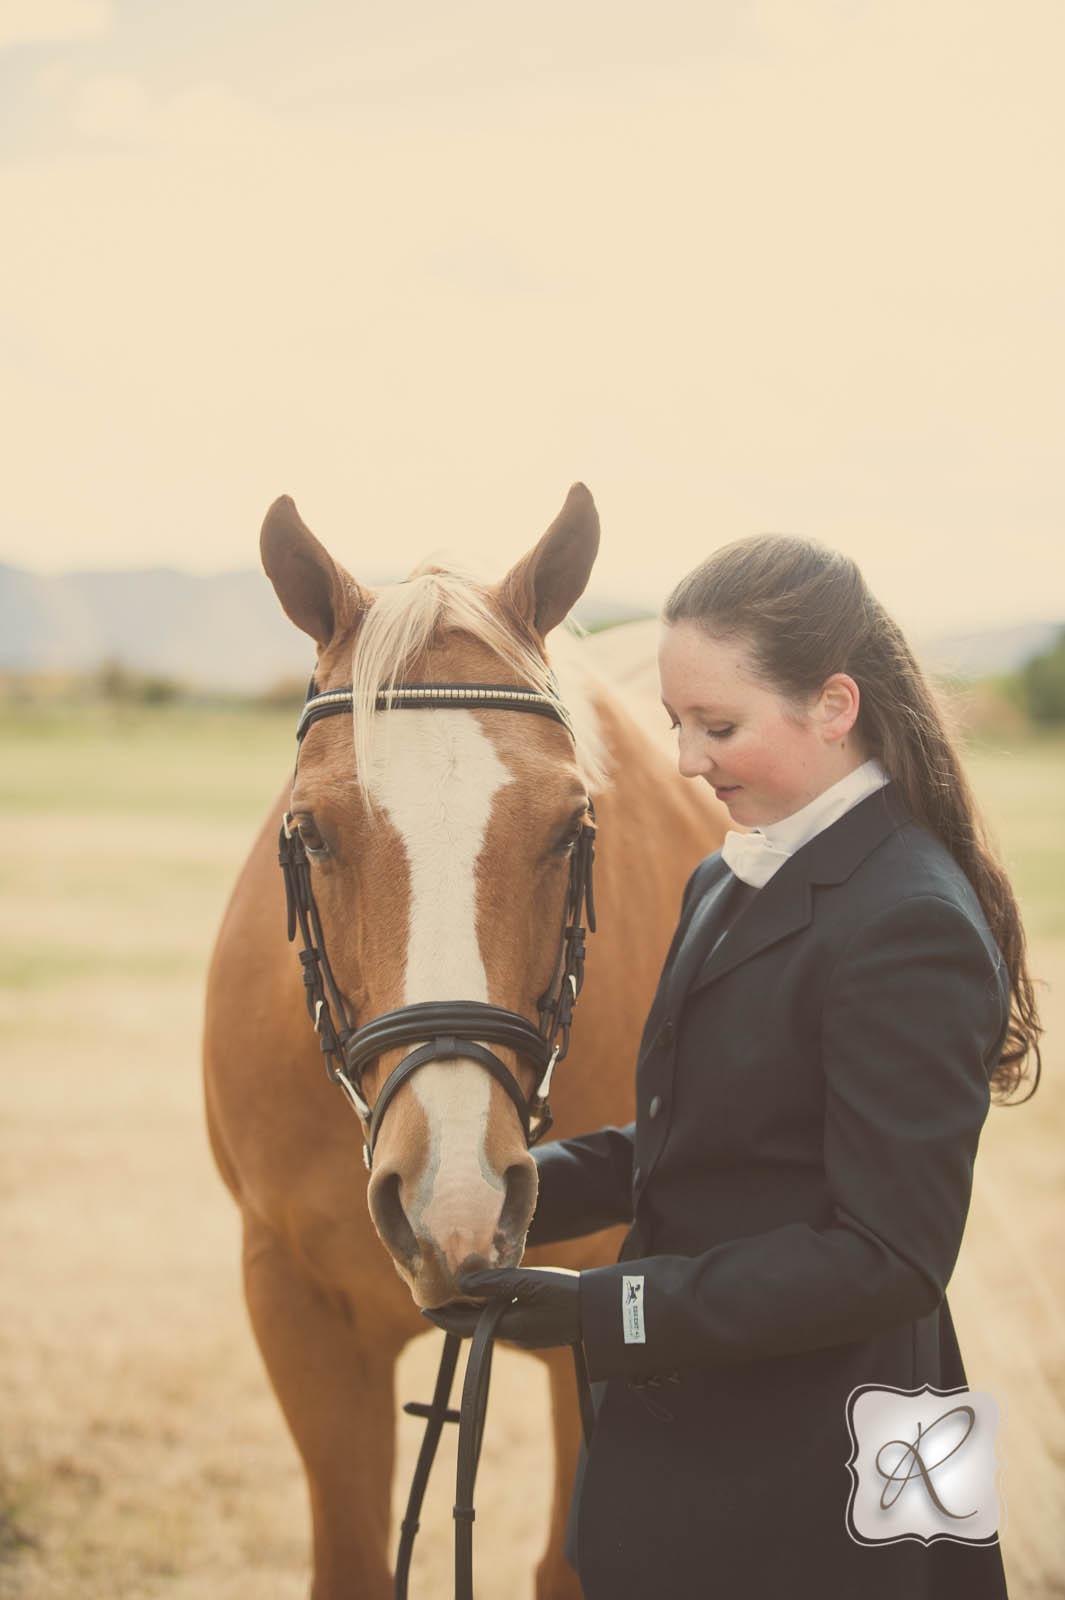 emmas senior pictures with her horse durango wedding